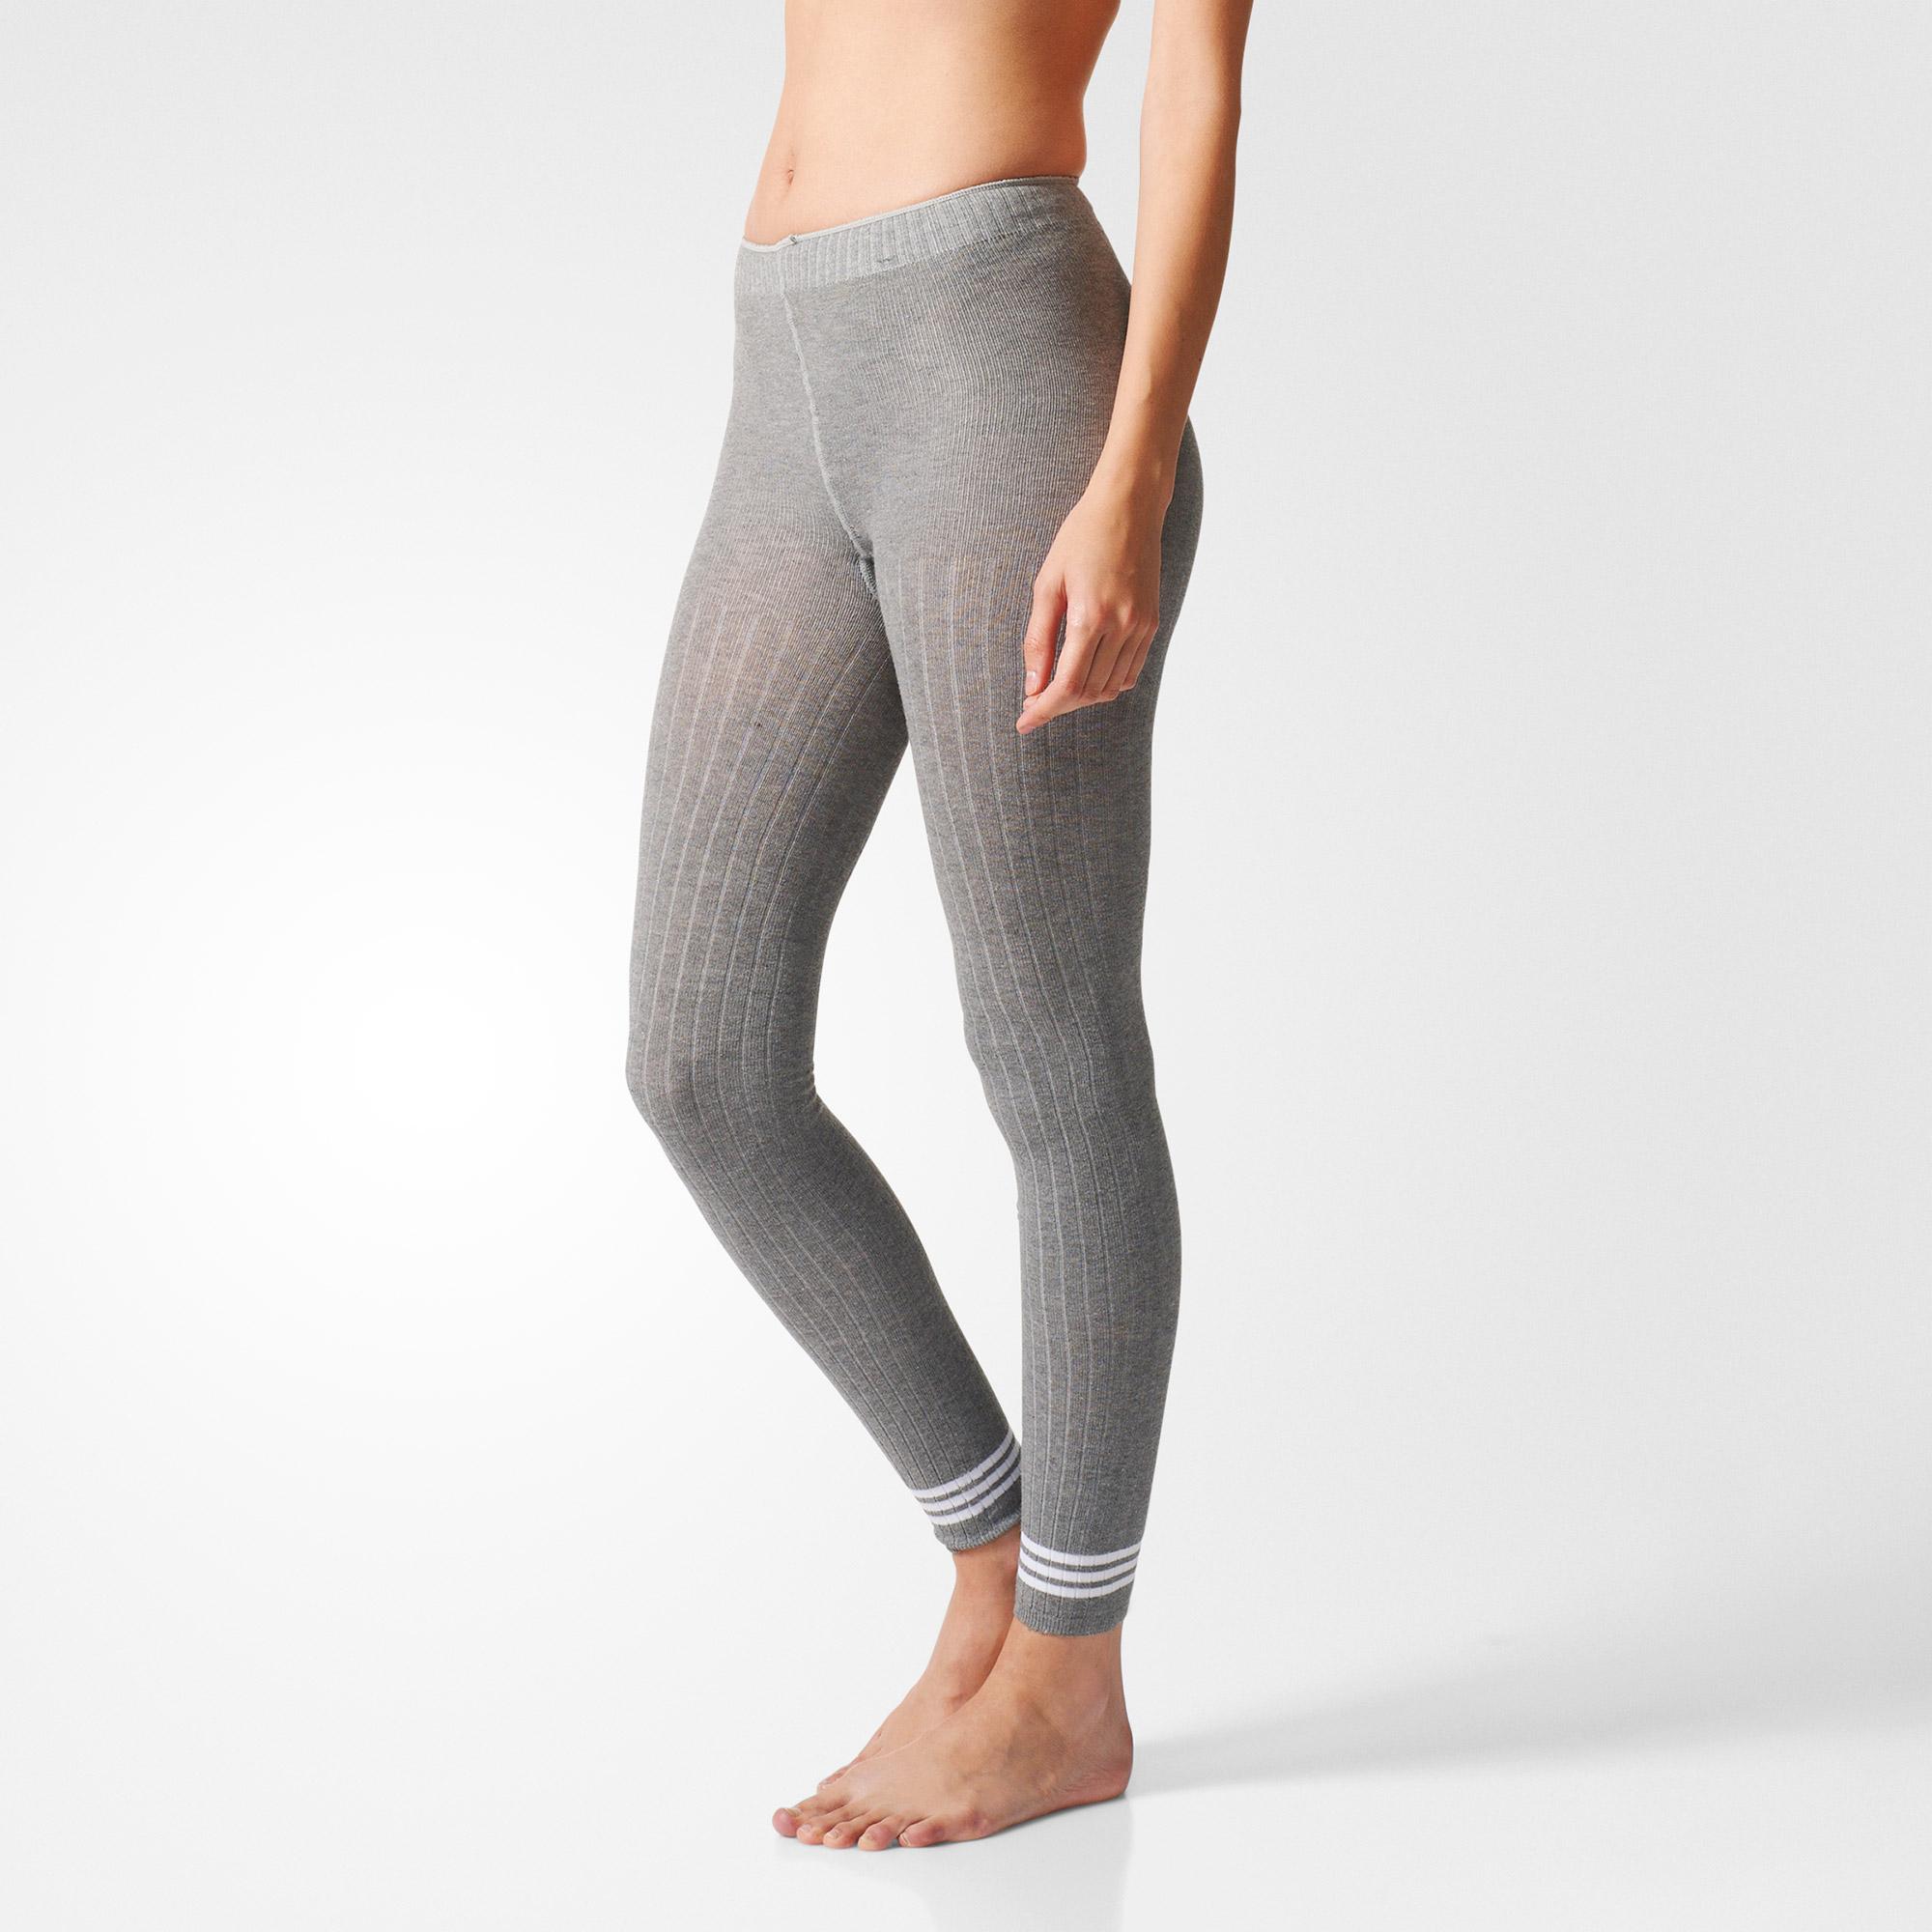 1e64ba1cd21873 Women's Adidas Tights - Hyke Leggings 3S - Grey   ACTIVEWEAR ...